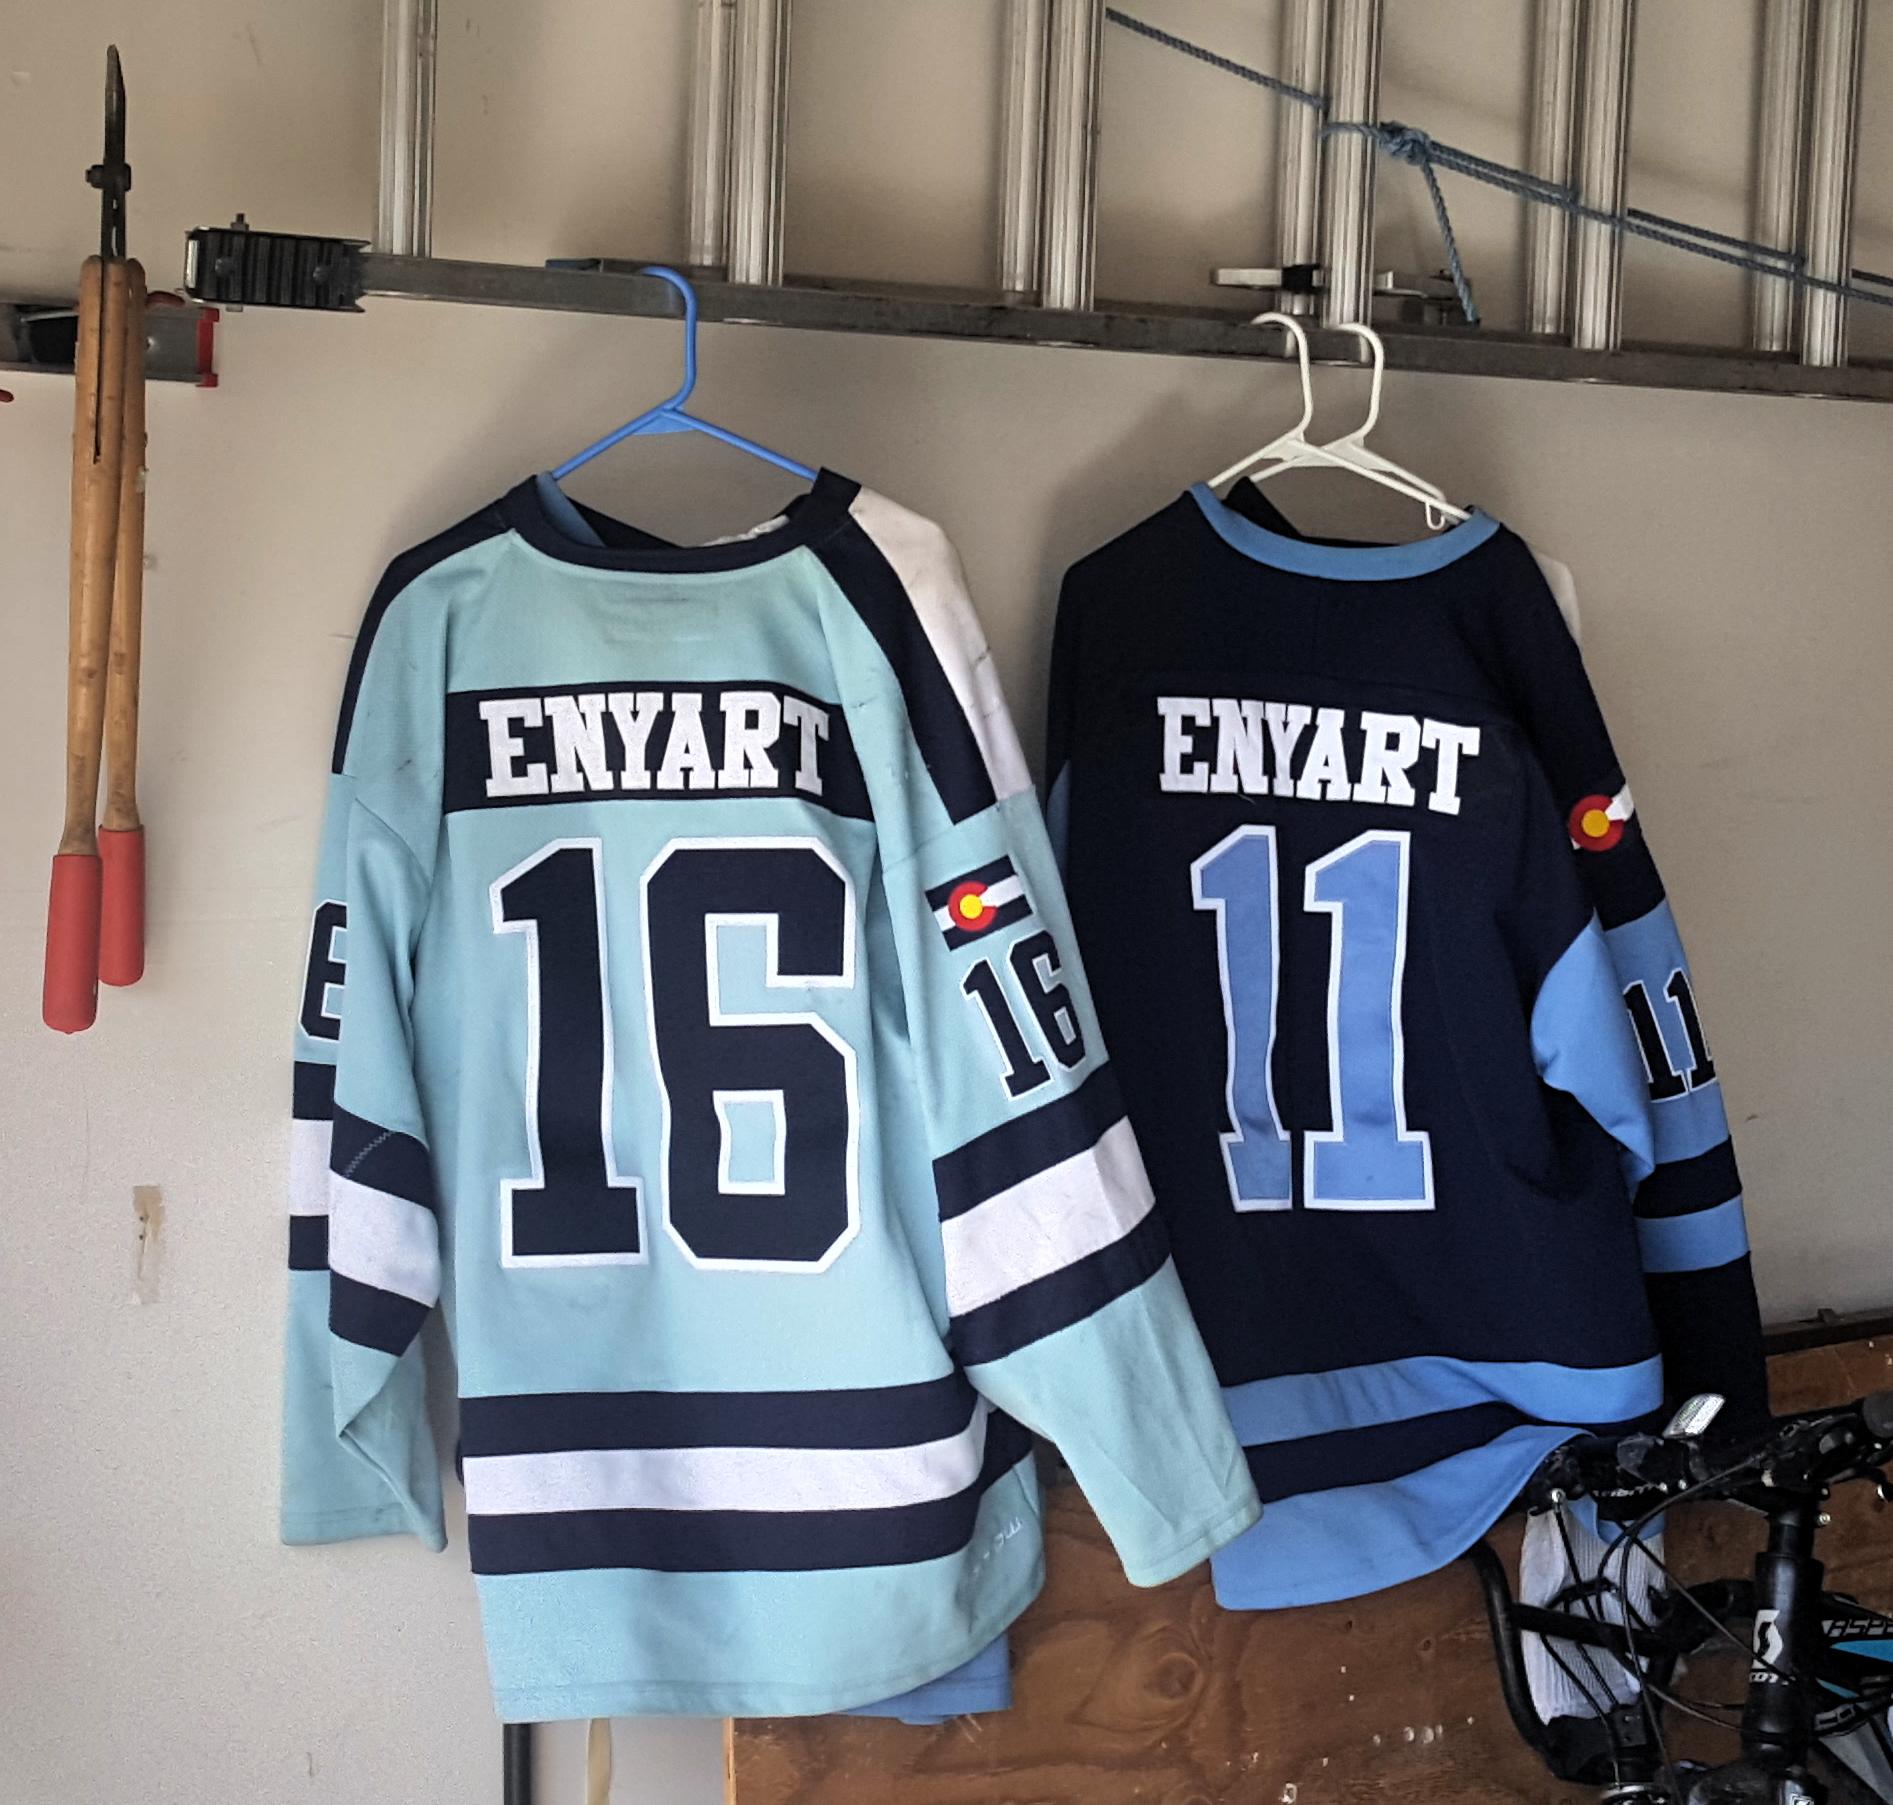 1611 KJV Debate photo of Enyart sons hockey jerseys, #16 & #11, handing in the garage